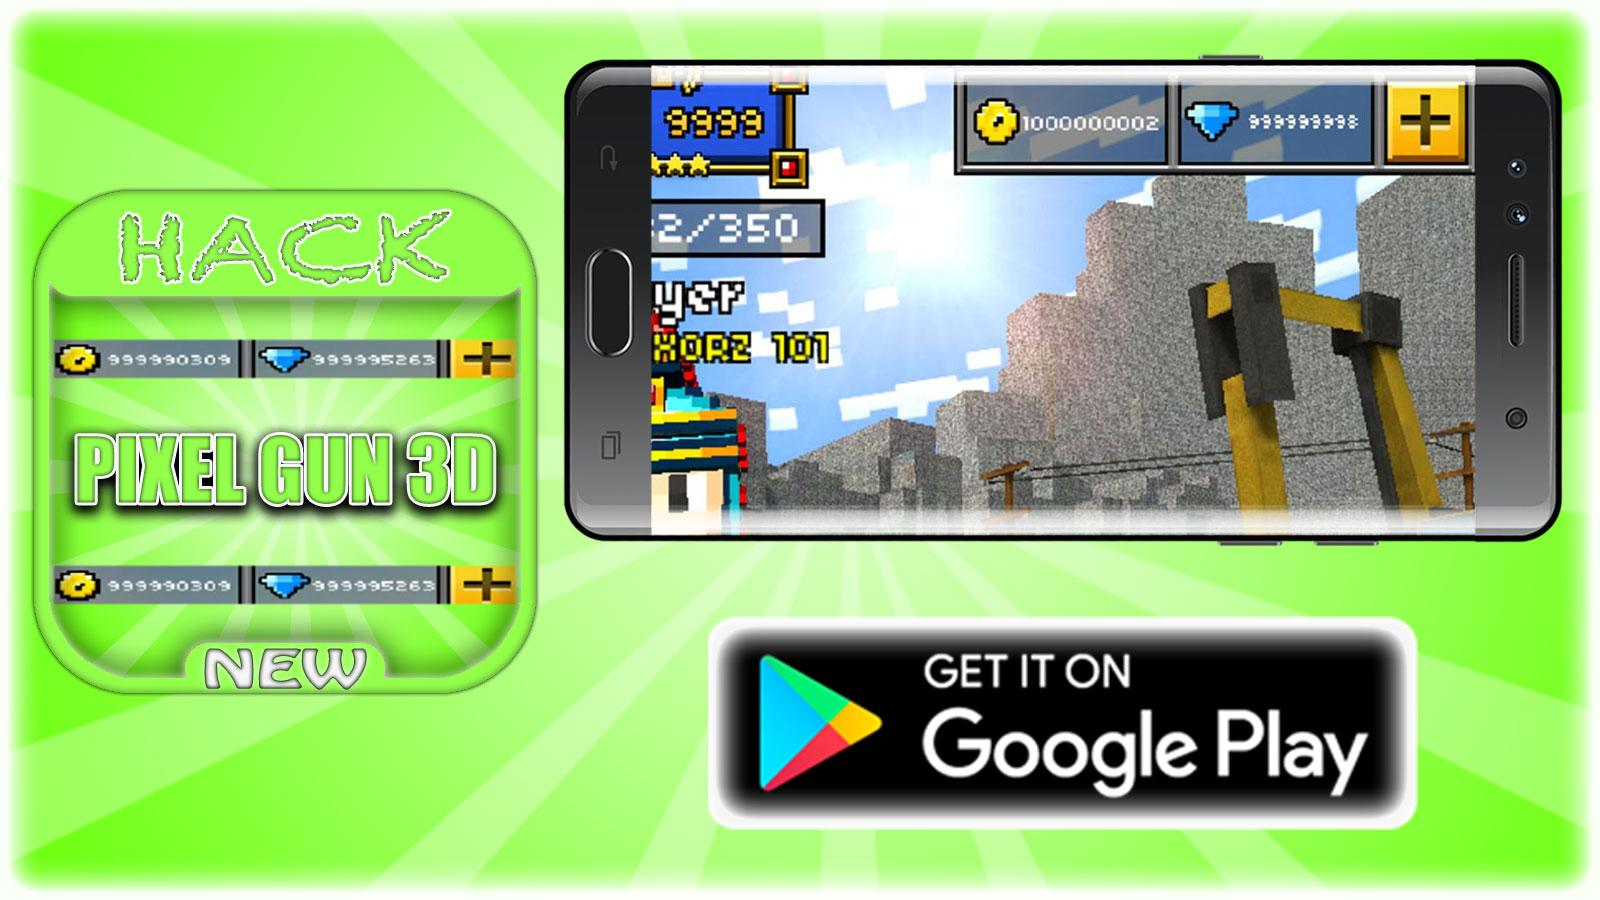 hack for pixel gun 3d game app joke prank android apps on hack for pixel gun 3d game app joke prank screenshot